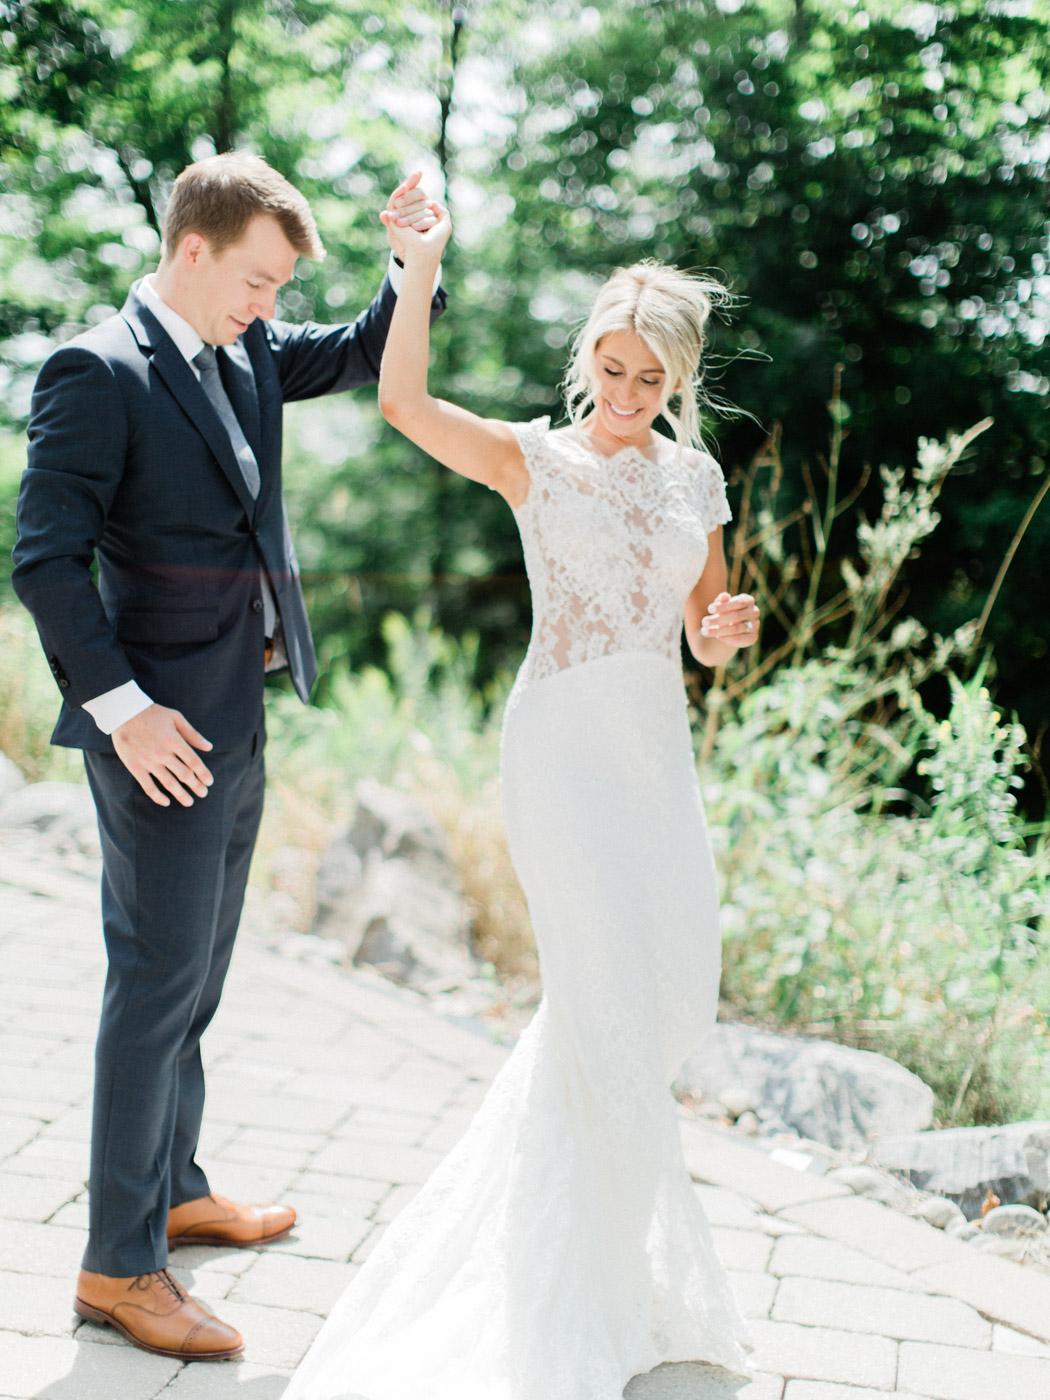 Toronto-Muskoka-wedding-photographer-summery-fun-documentary-the-marriott-rosseau39.jpg